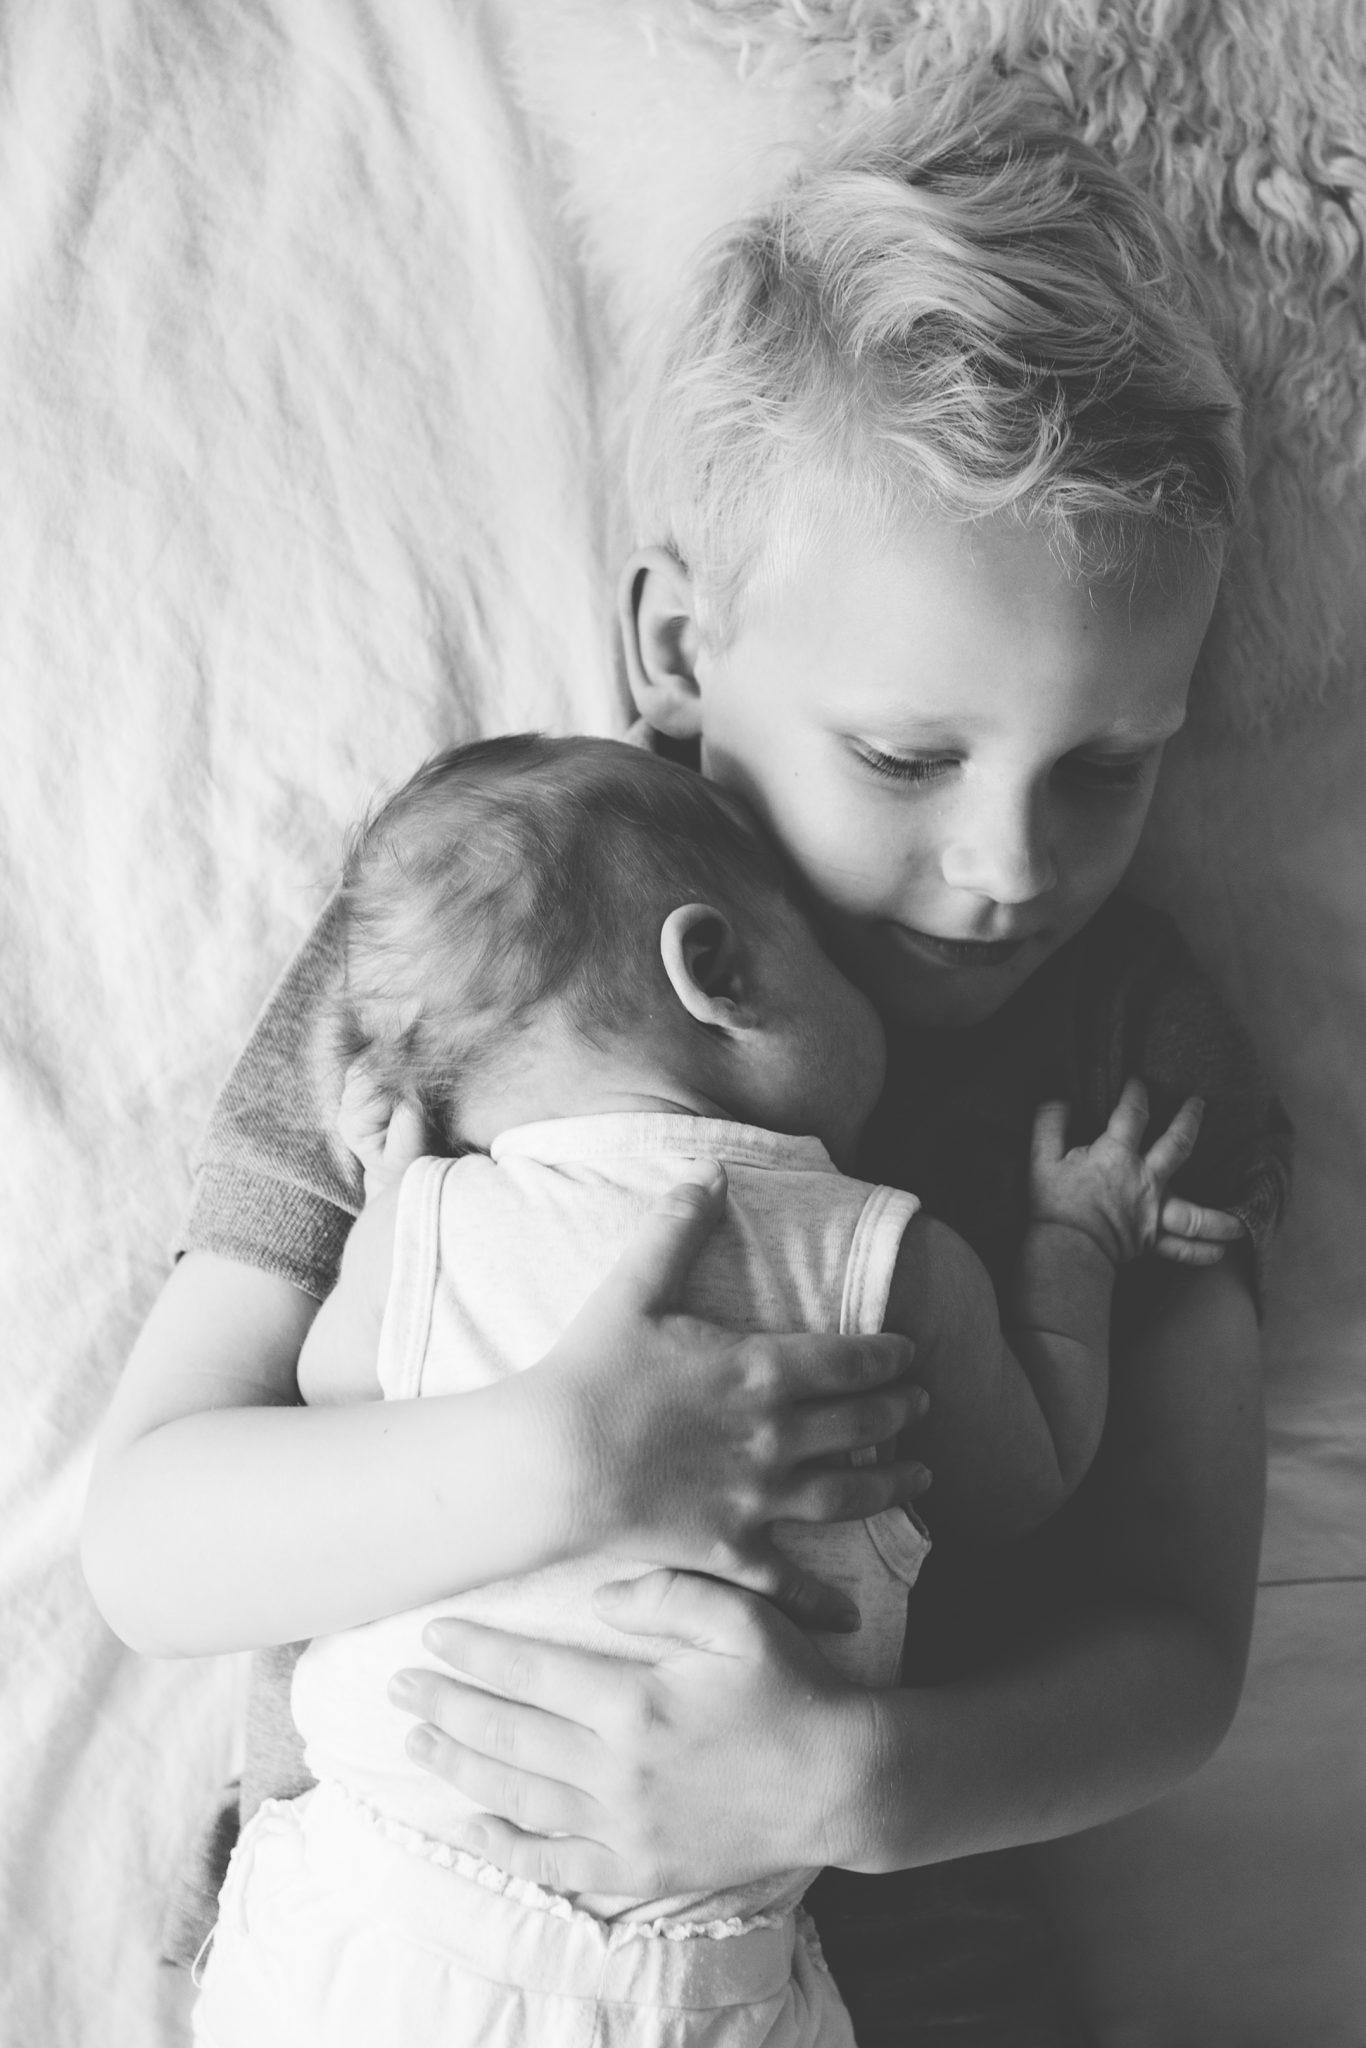 lifestyle newborn shoot babyshoot amersfoort newborn fotografie laura elkhuizen fotografie